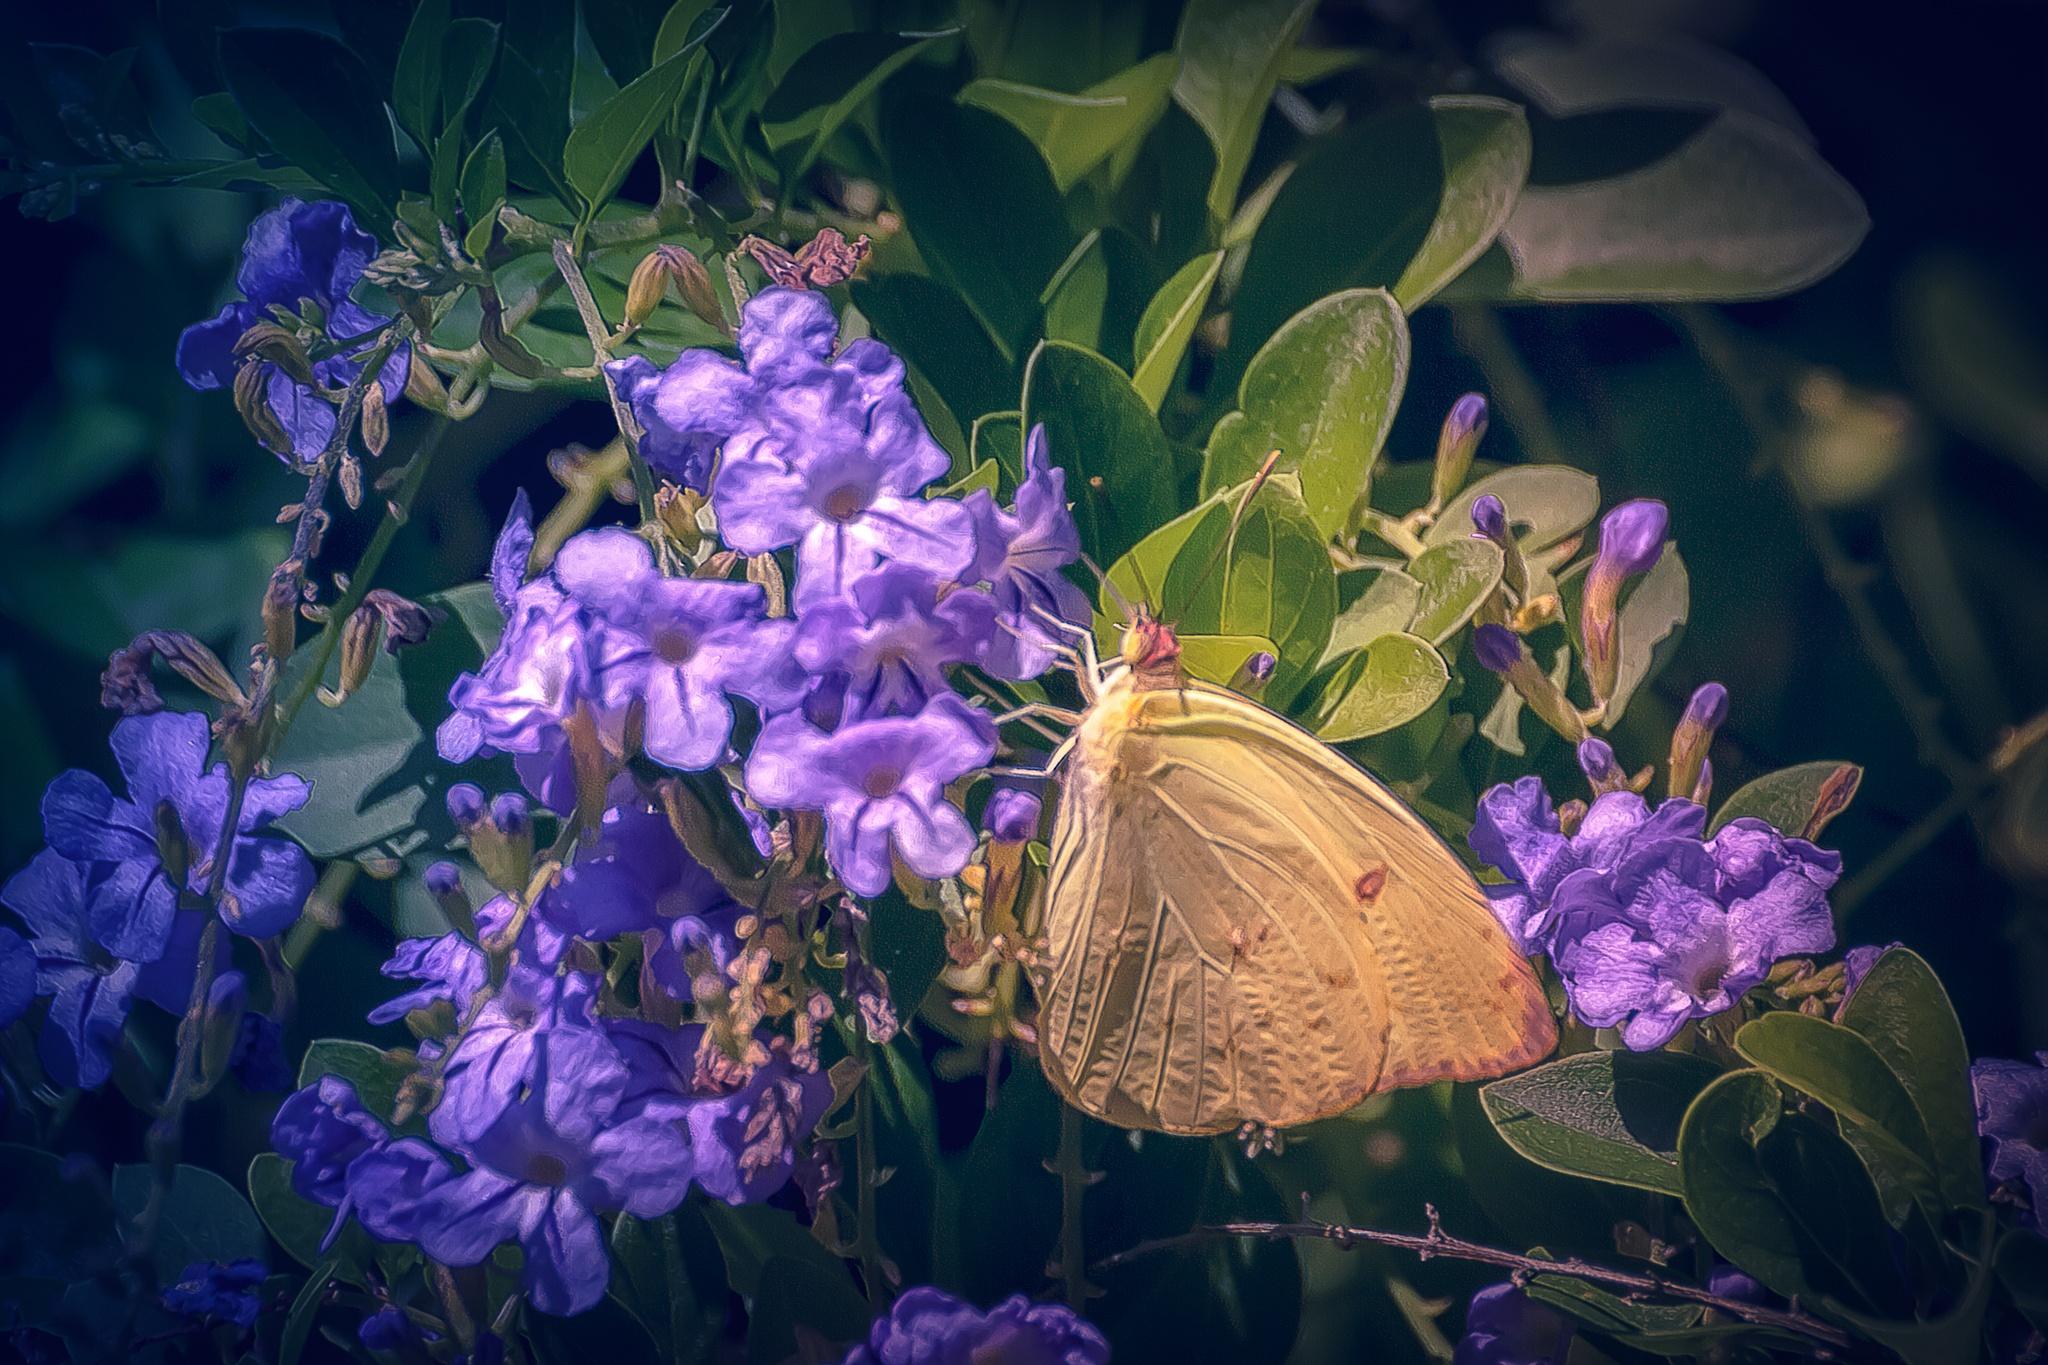 Butterfly 115 - Phoebis philea by Tony Guzman